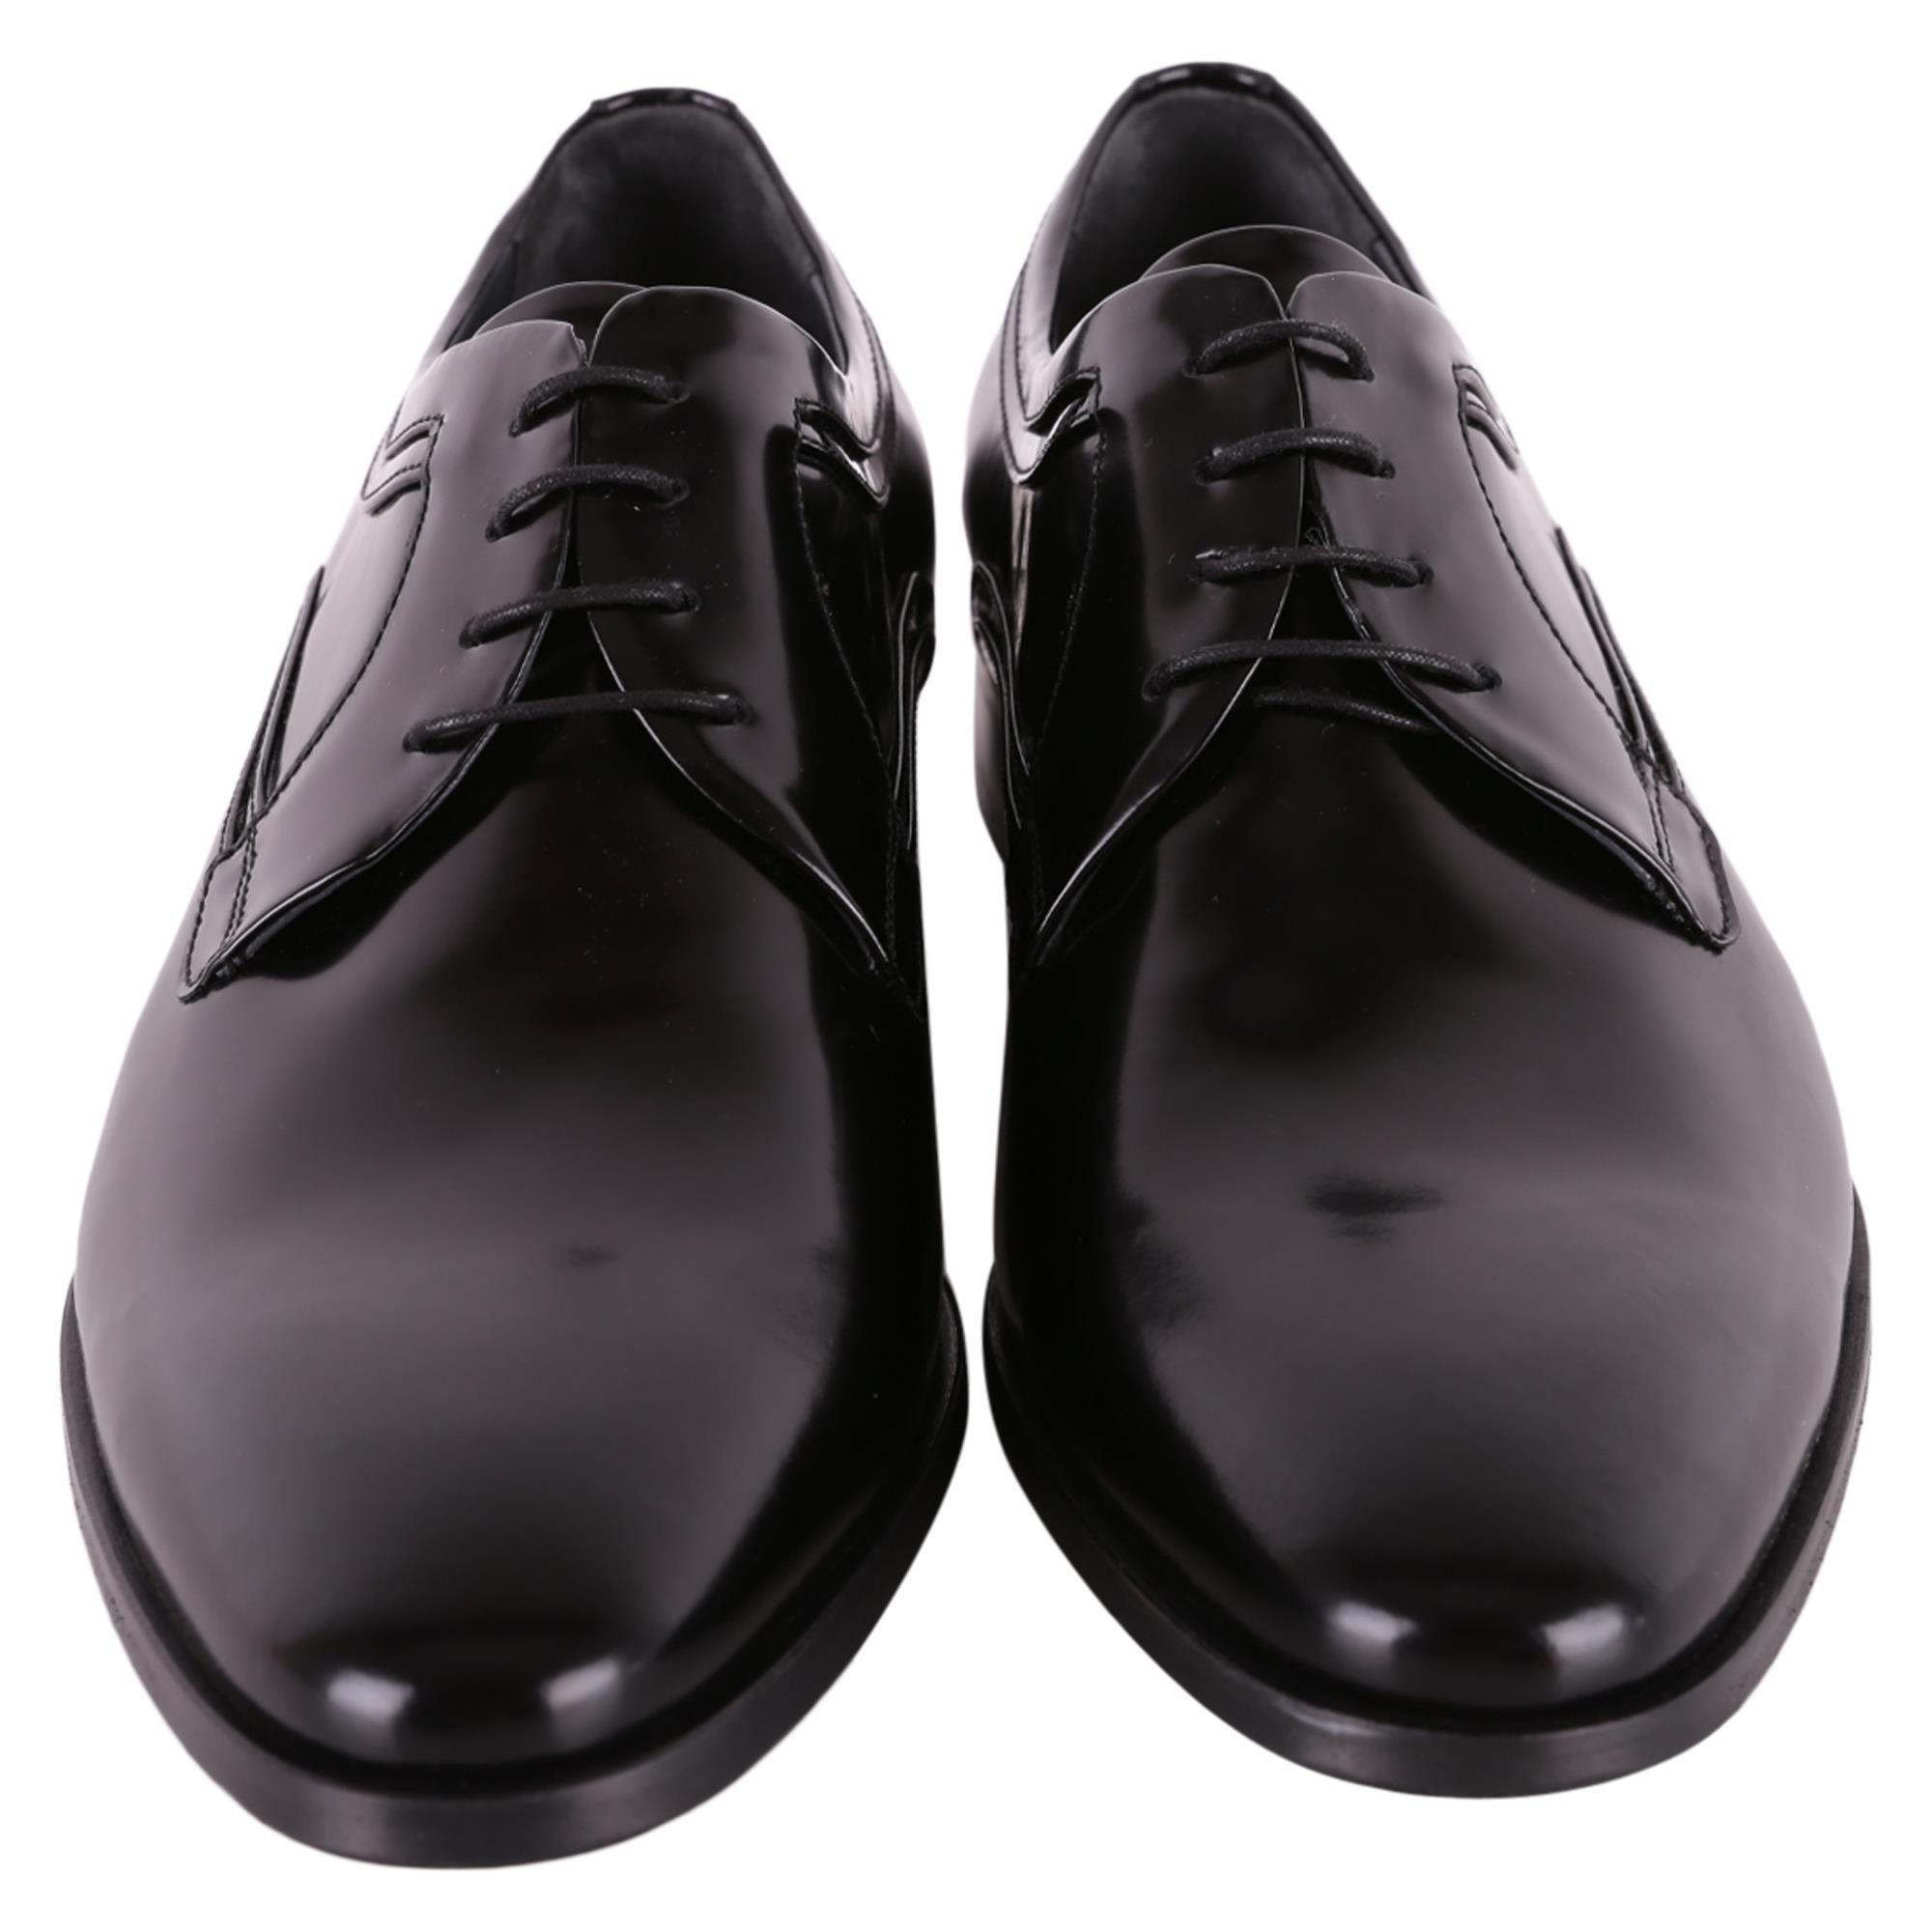 CARLO PIGNATELLI MEN'S 36Z0144GIOVE10NERO BLACK LEATHER LACE-UP SHOES